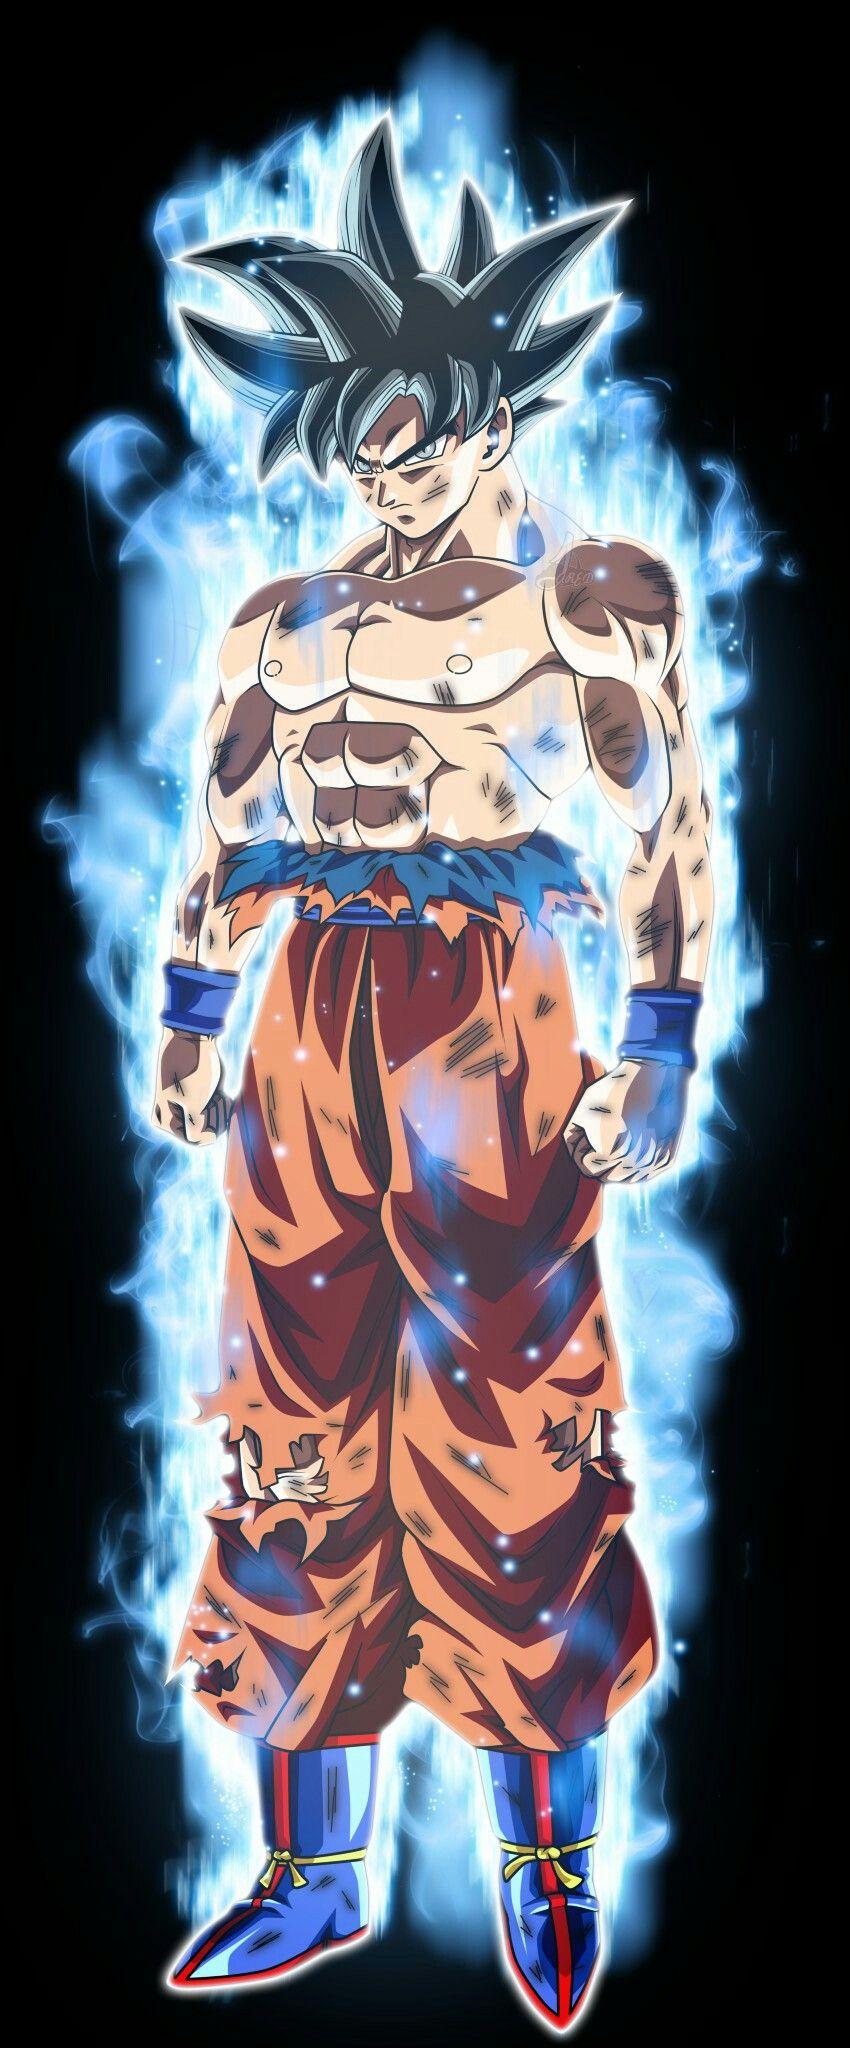 Son Goku Limit Breaker Personajes De Dragon Ball Dragones Personajes De Goku